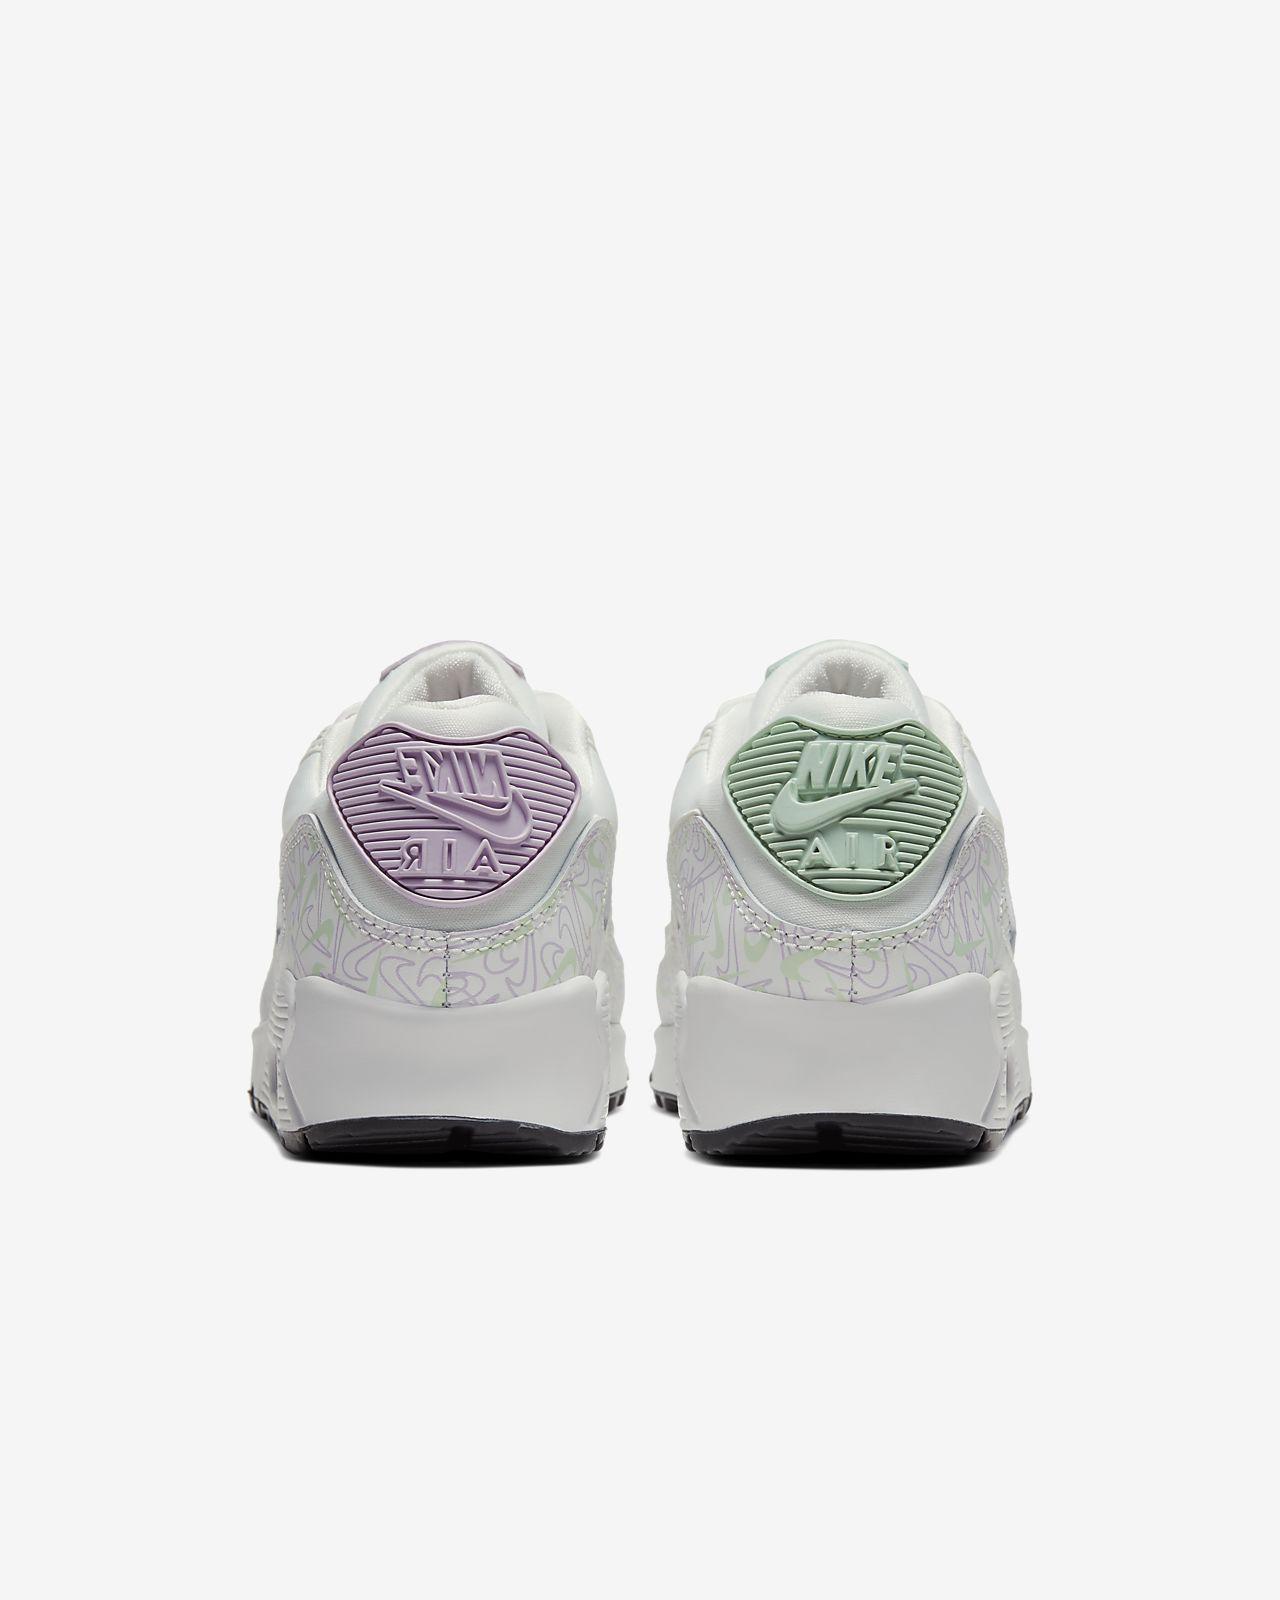 Nike Air Max 90 Womens Valentines Day Ci7395 100 Pair